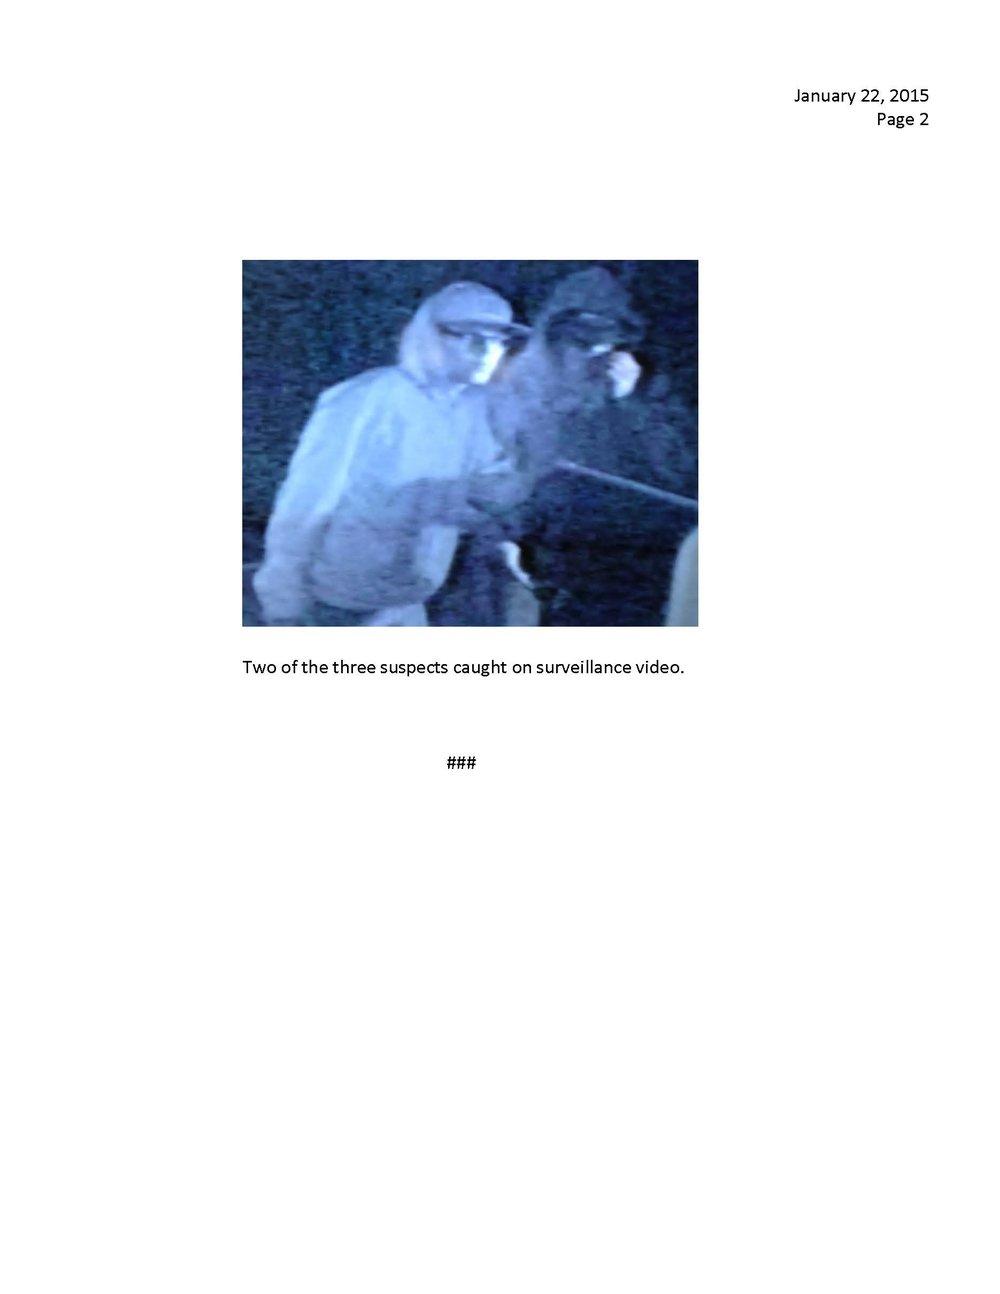 012215 Lakeside Vandalism_Page_2